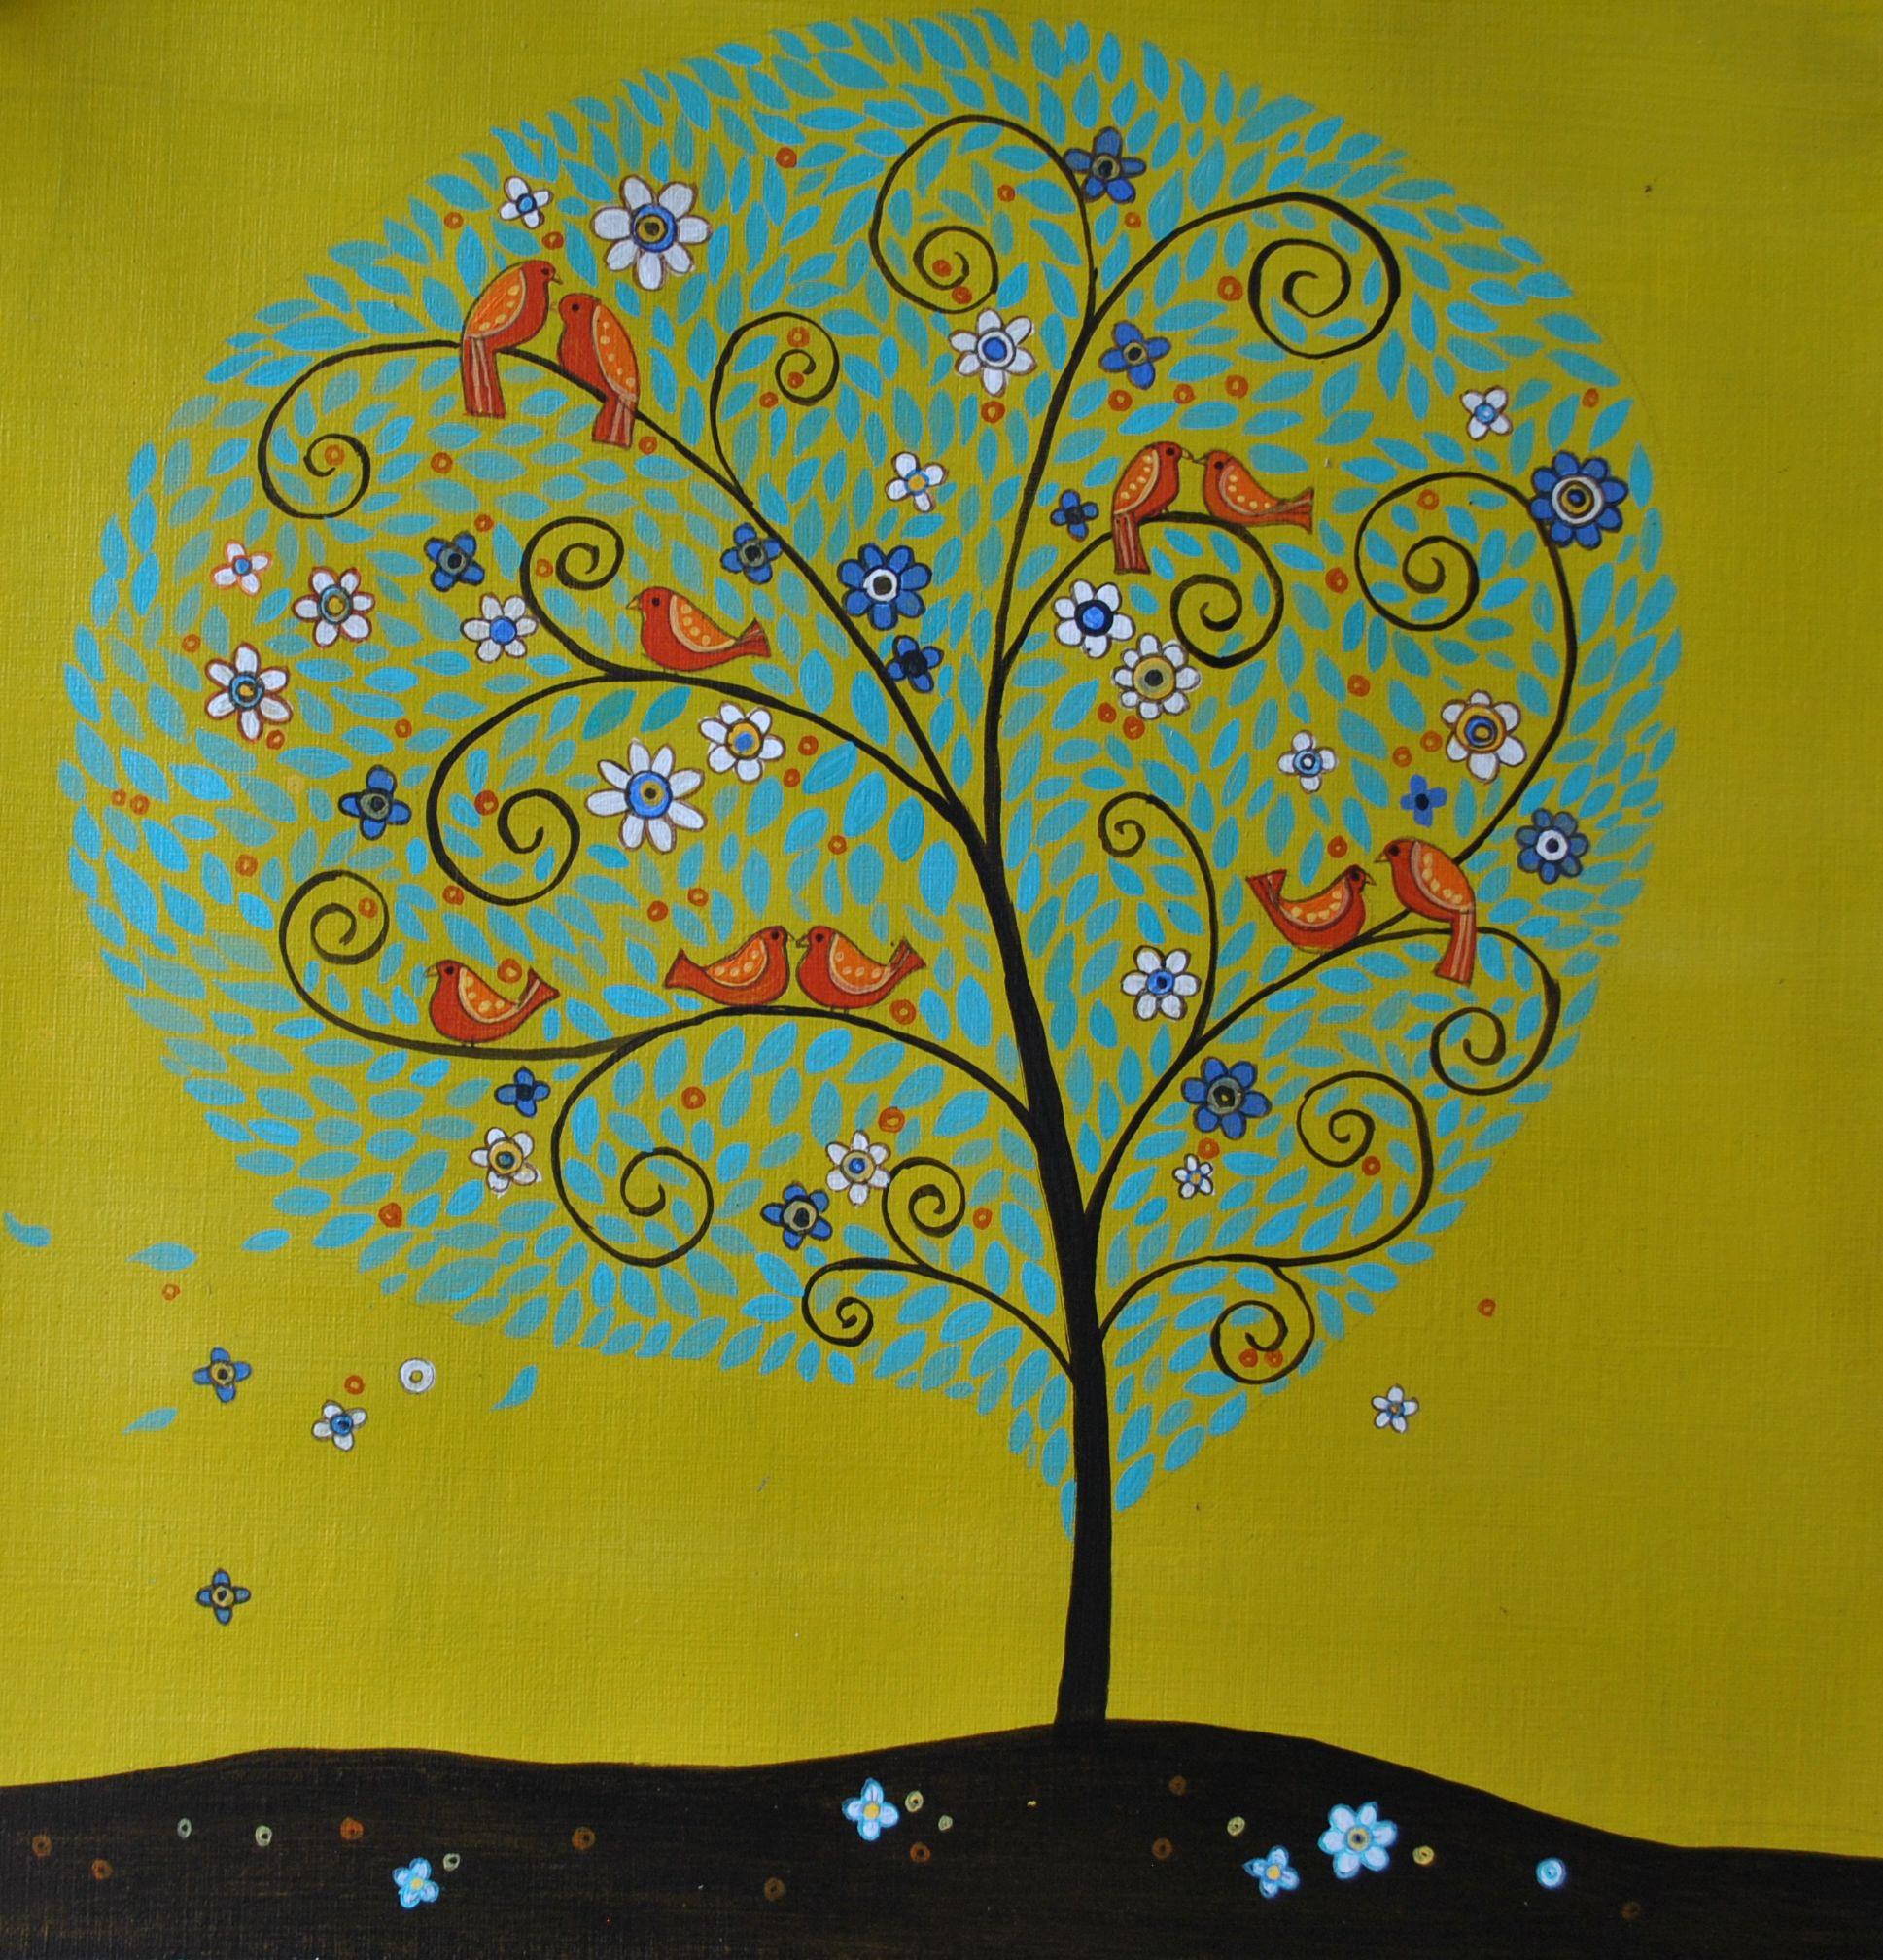 Spring time Birds,Acrylic painting on Textured board, Folk style Art ...